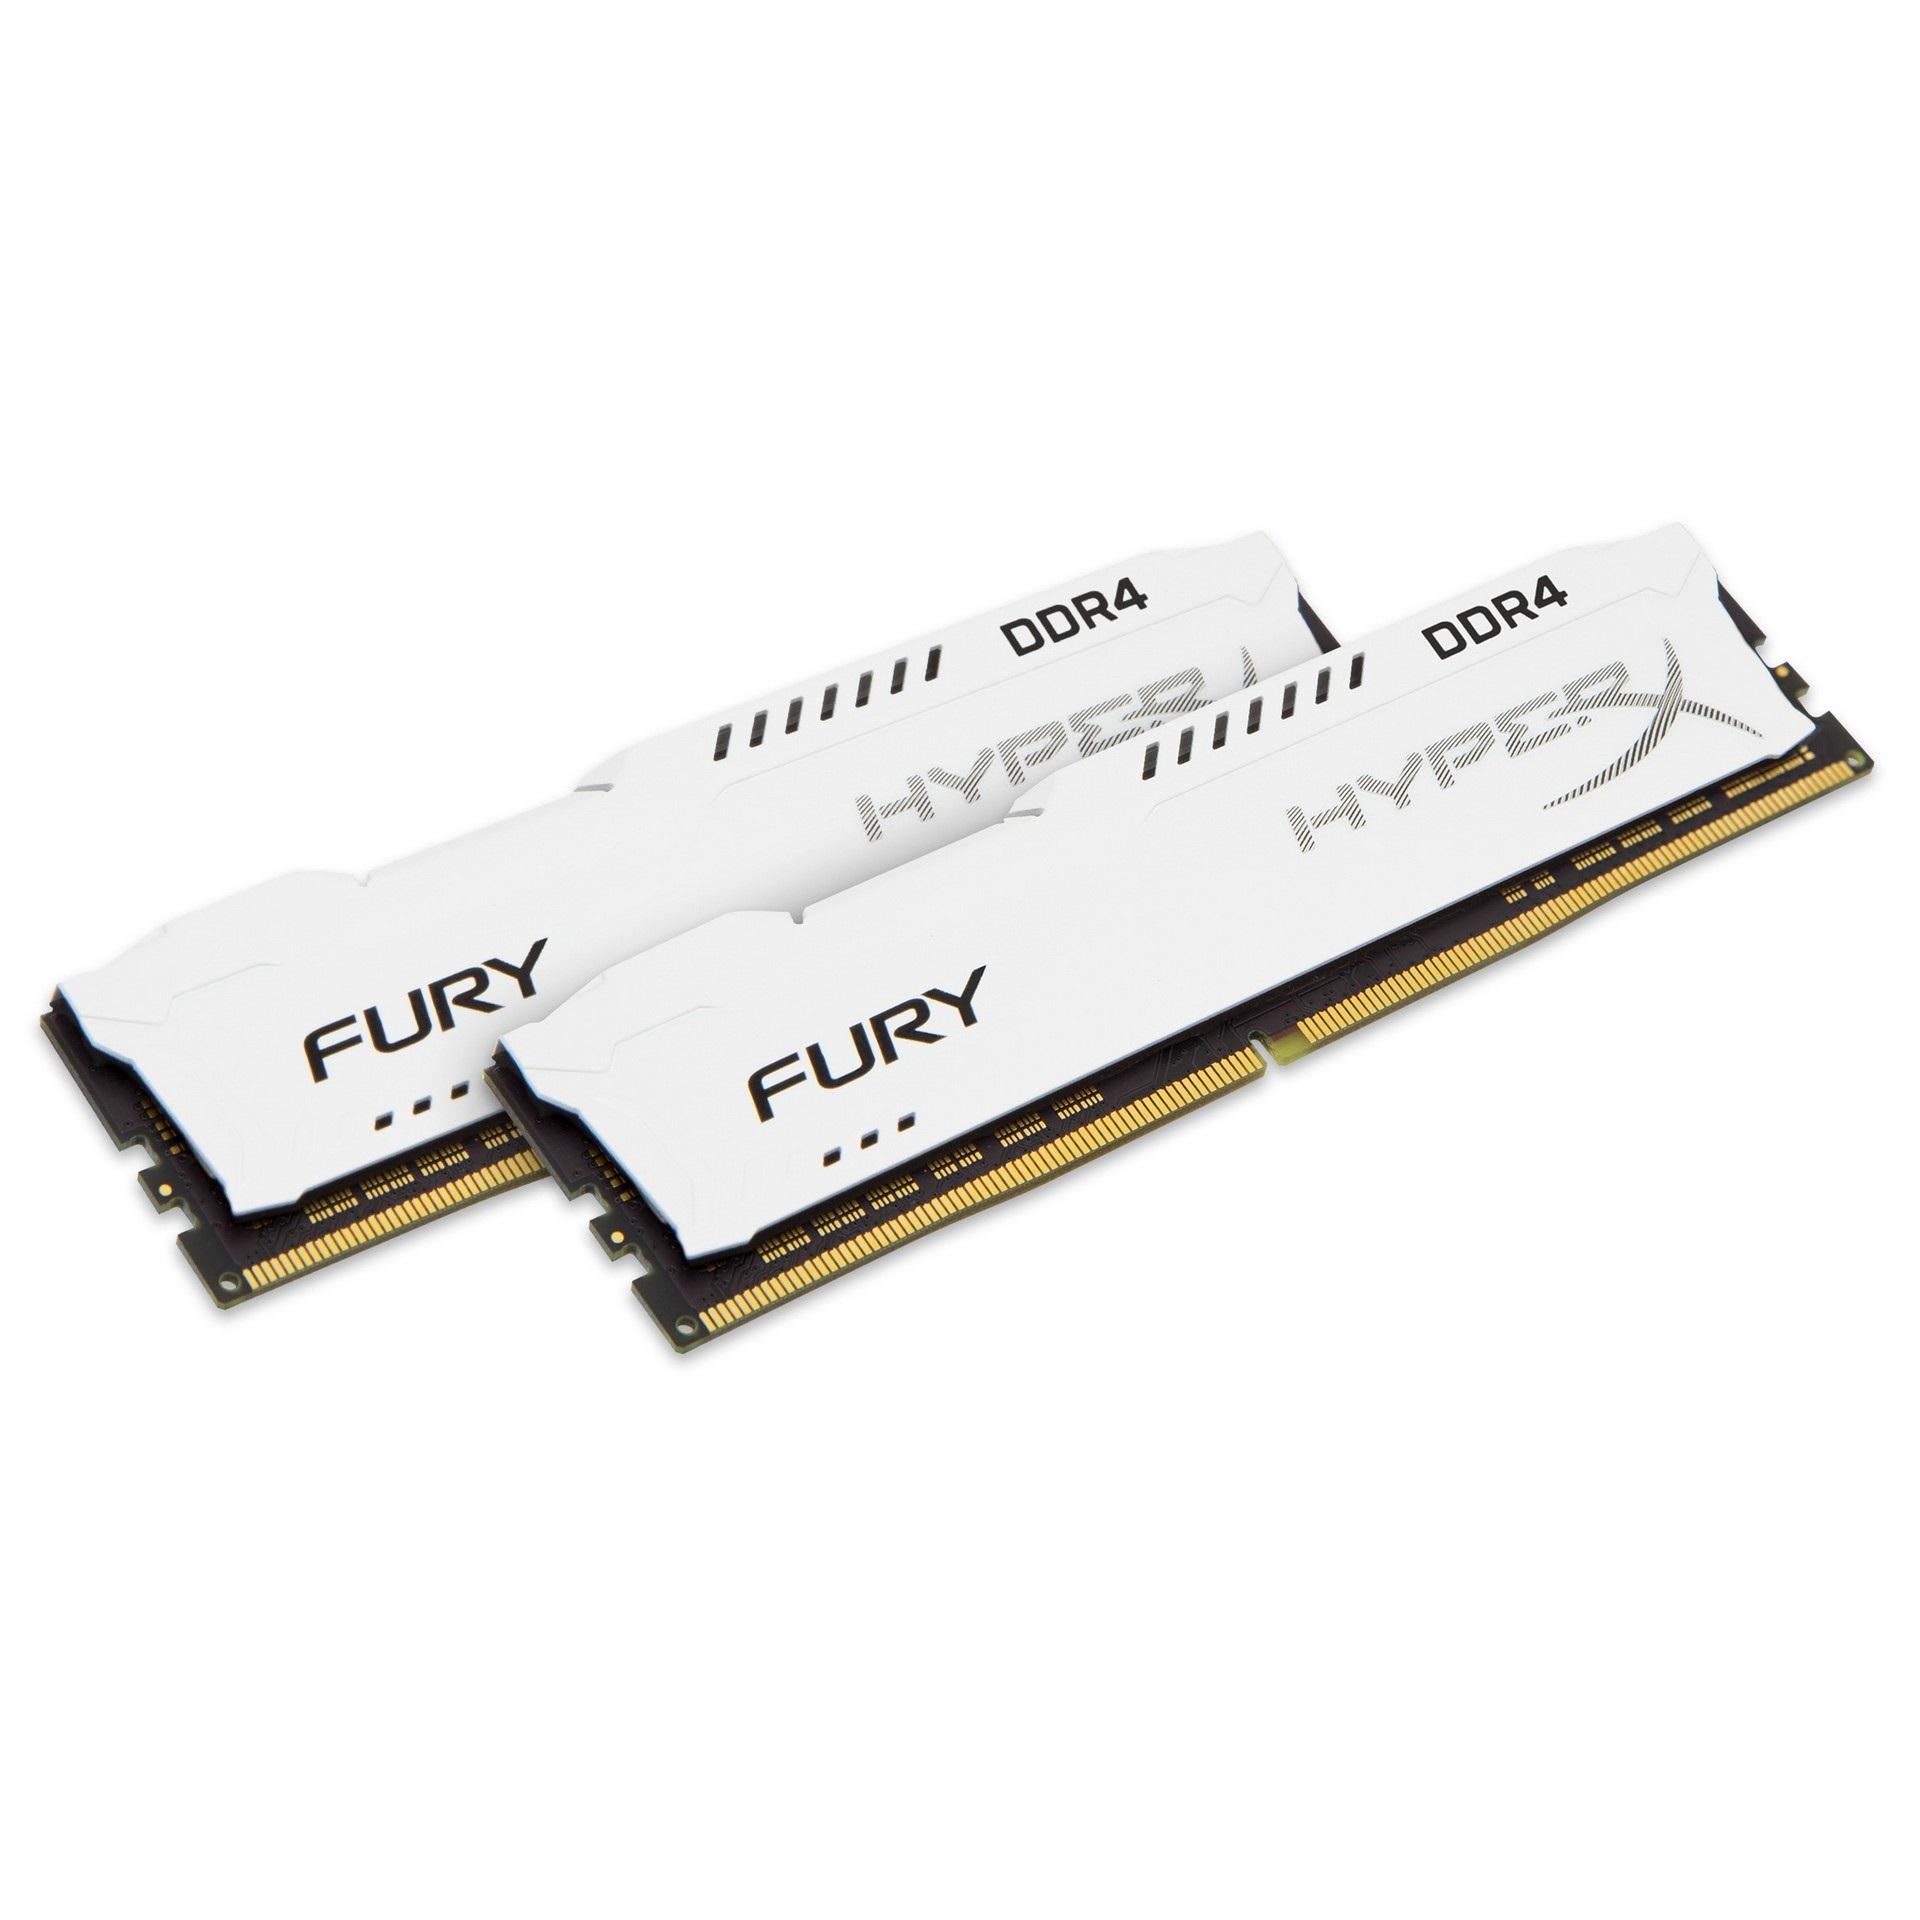 Kingston HyperX FURY White 16GB DDR4 2400MHz 2x8GB